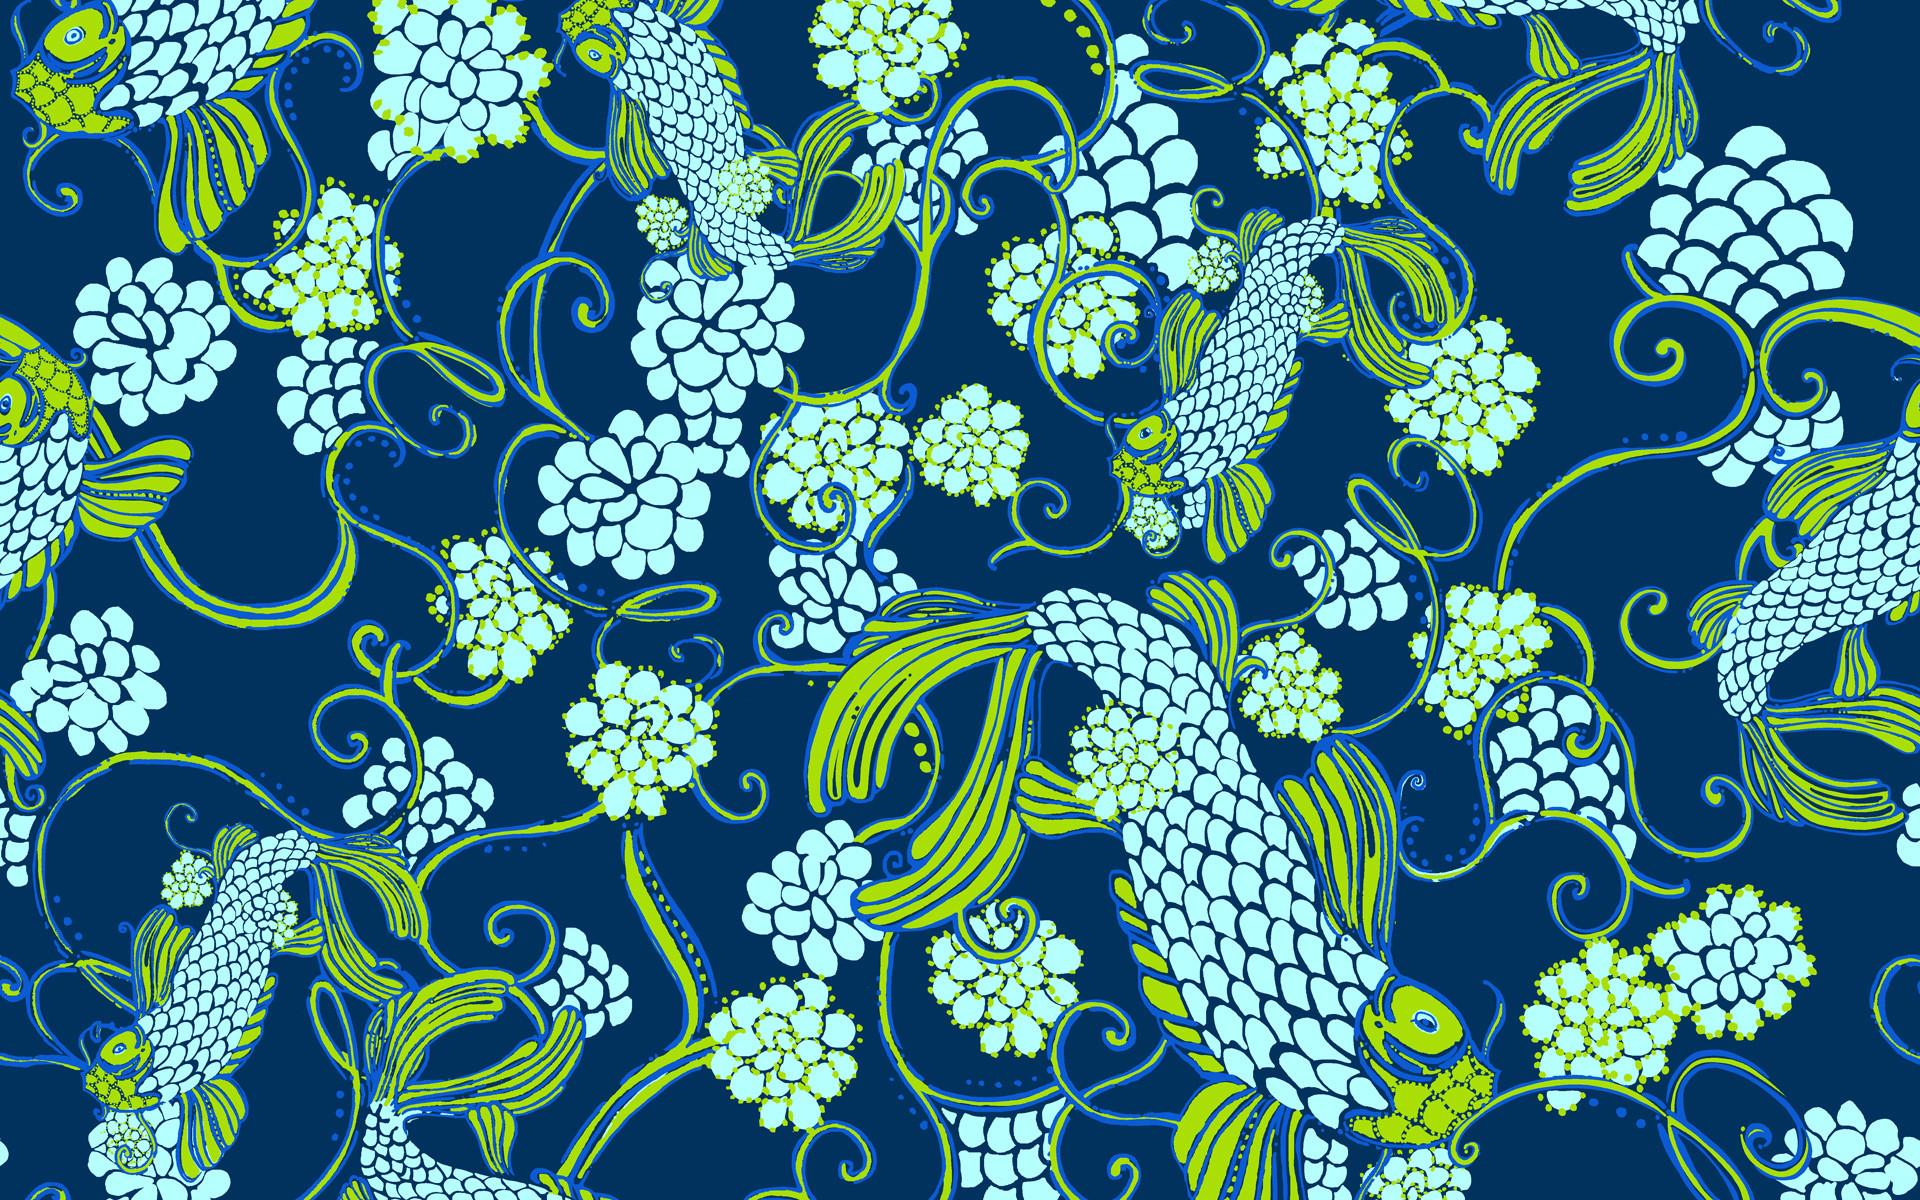 1920x1200 Lilly Pulitzer Sailboat Wallpapers HD Abstract Wallpaper